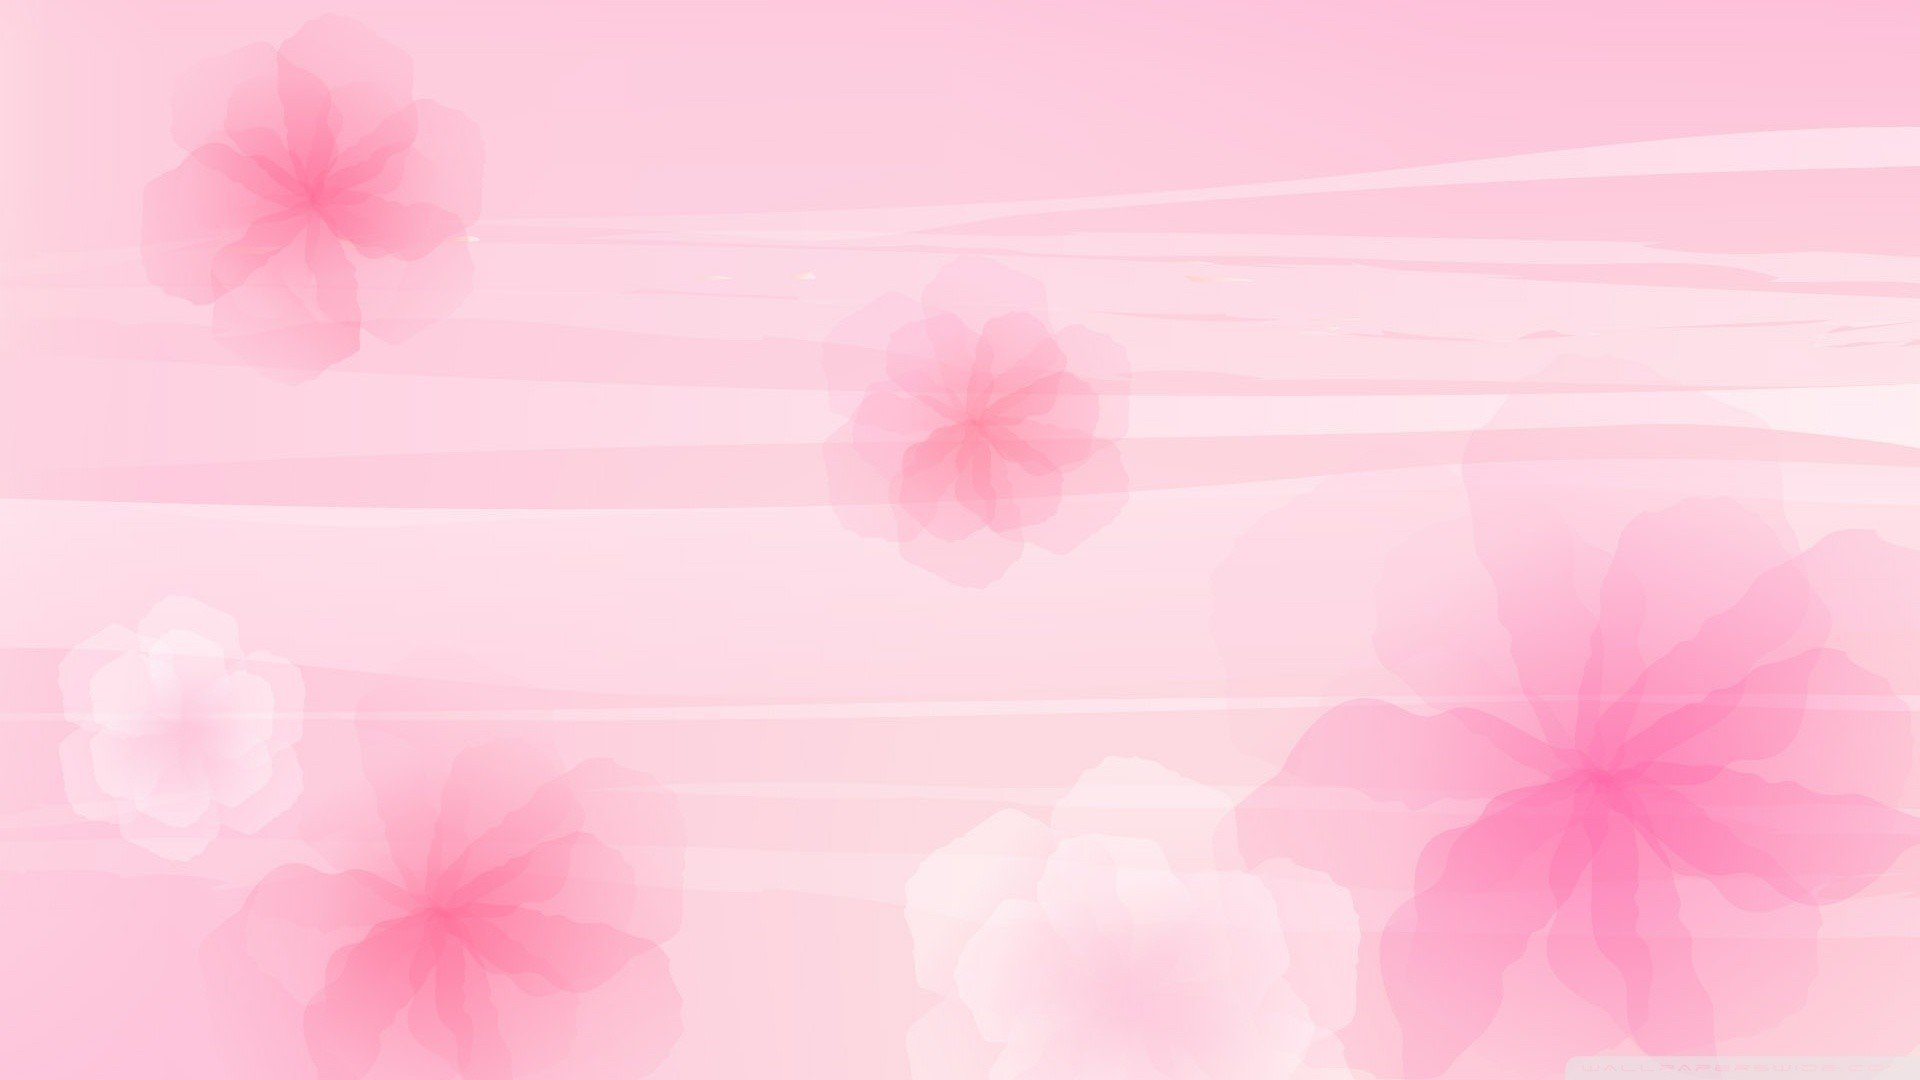 Baby Pink wallpaper photo hd